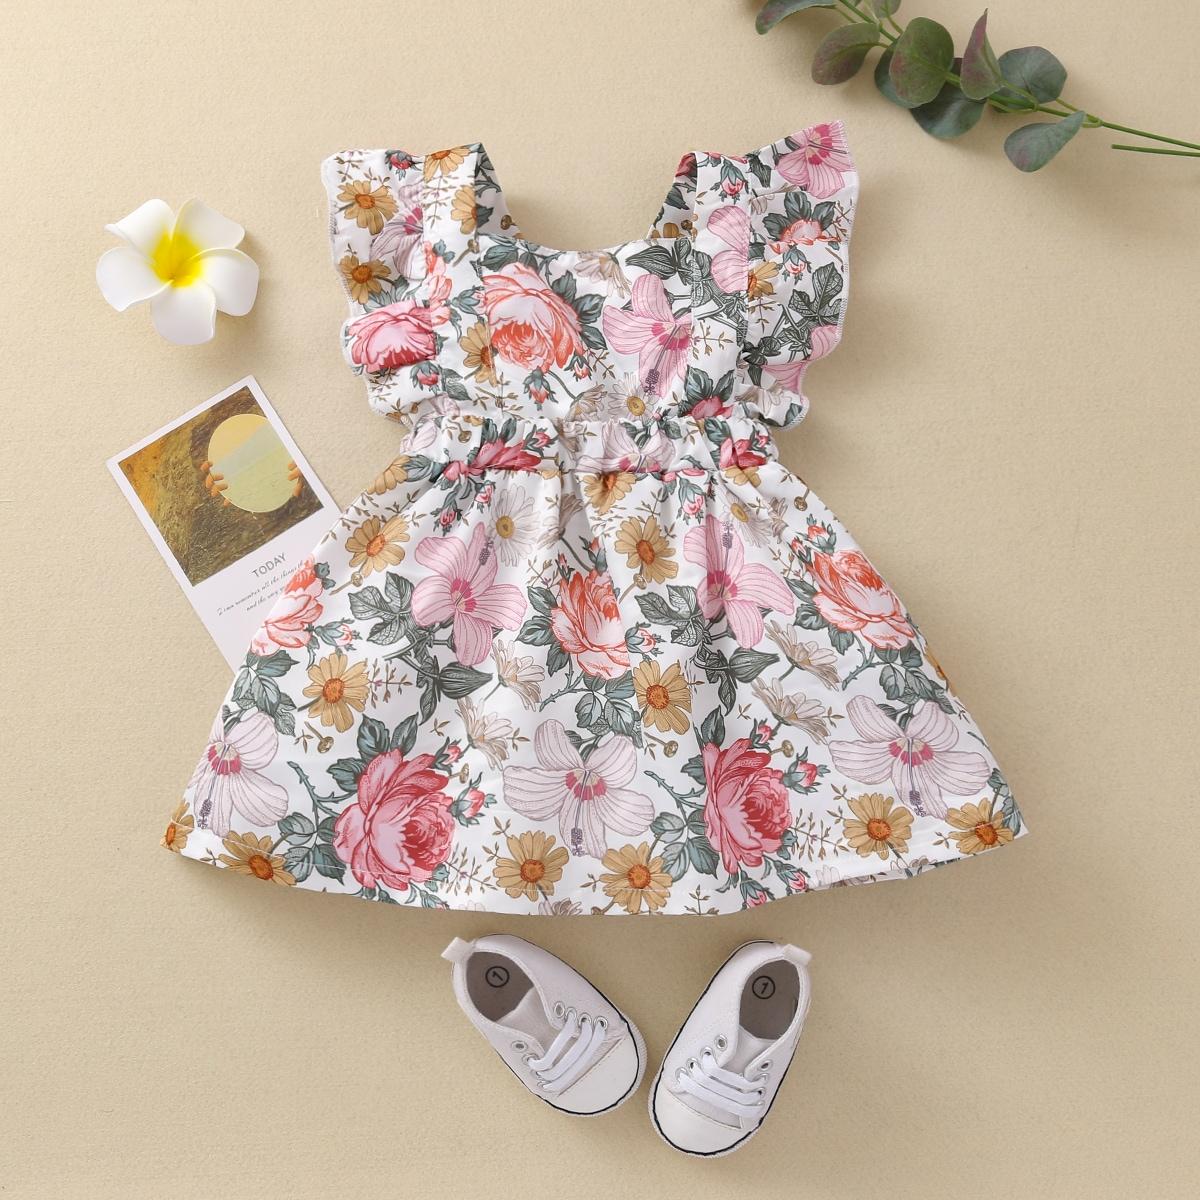 shein Boho Bloemen Baby-jurk Rimpeling